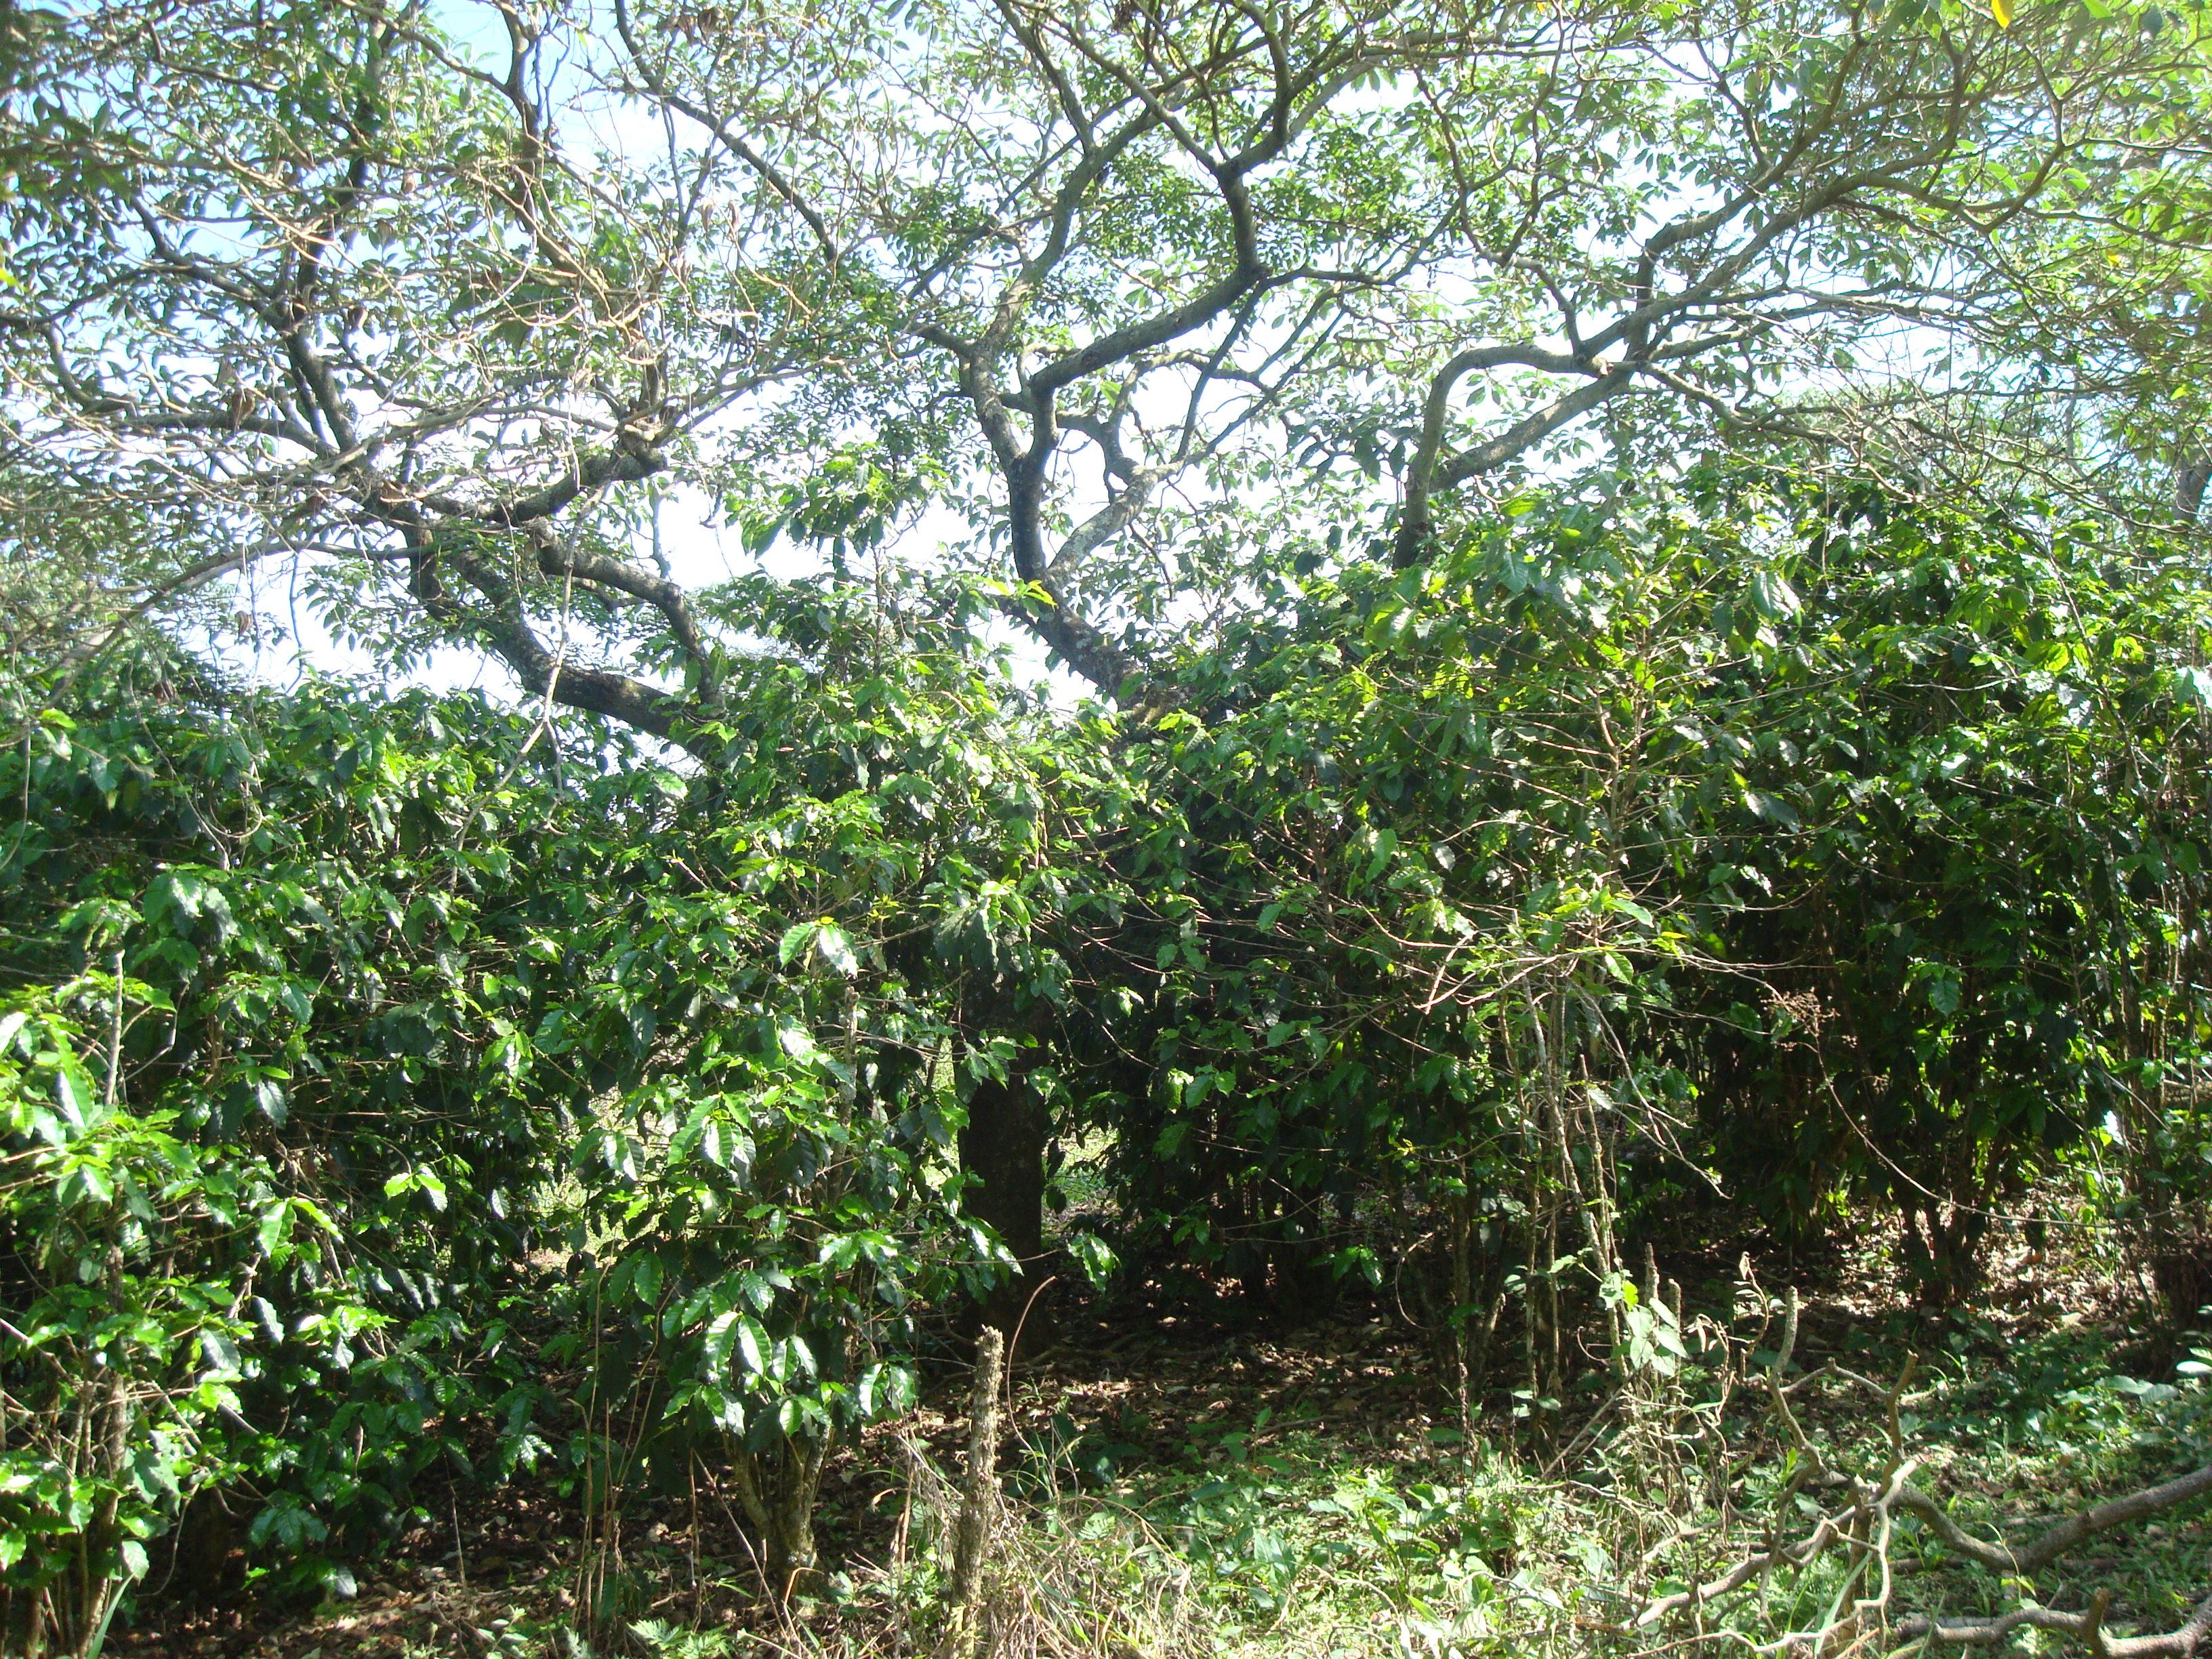 Agrofloresta  Fazenda Santo Antonio da Agua Limpa